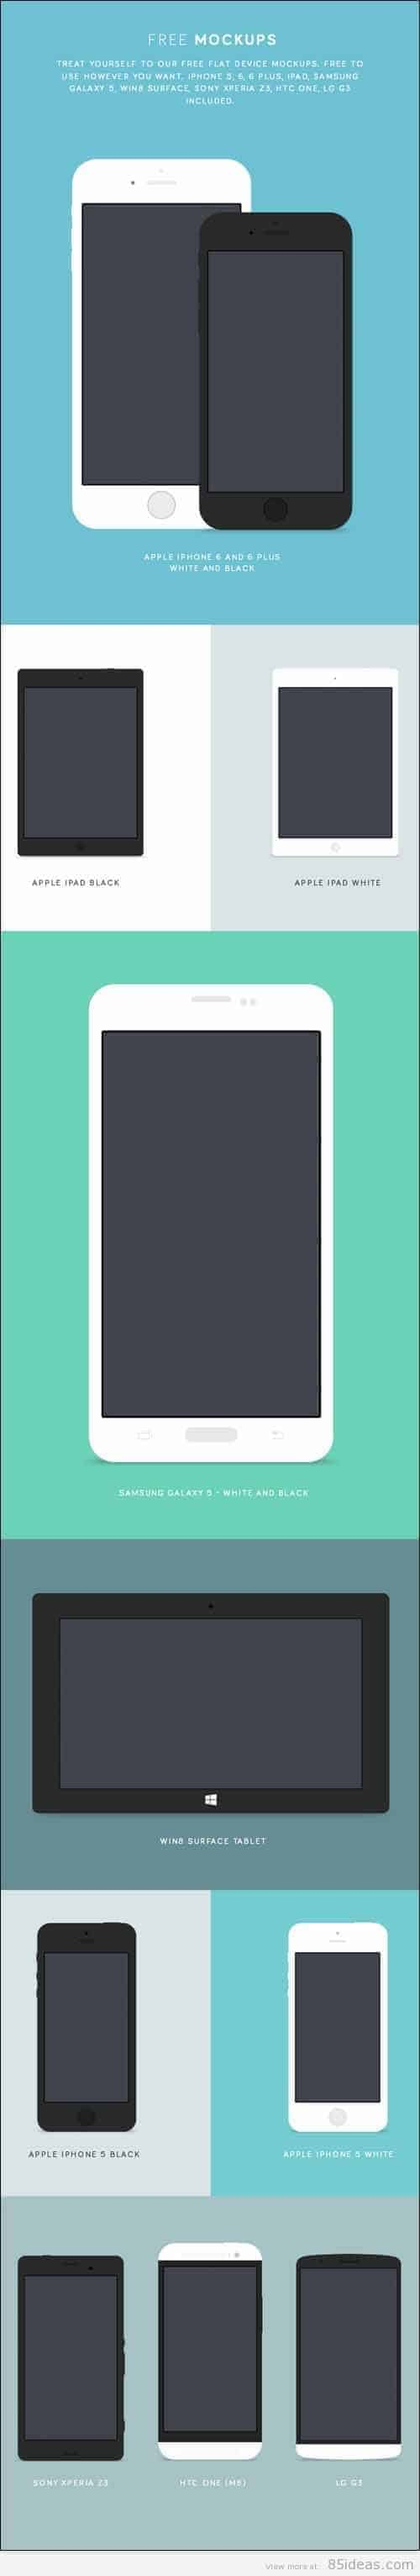 9 Free Mobile Phone PSD Device Mockups